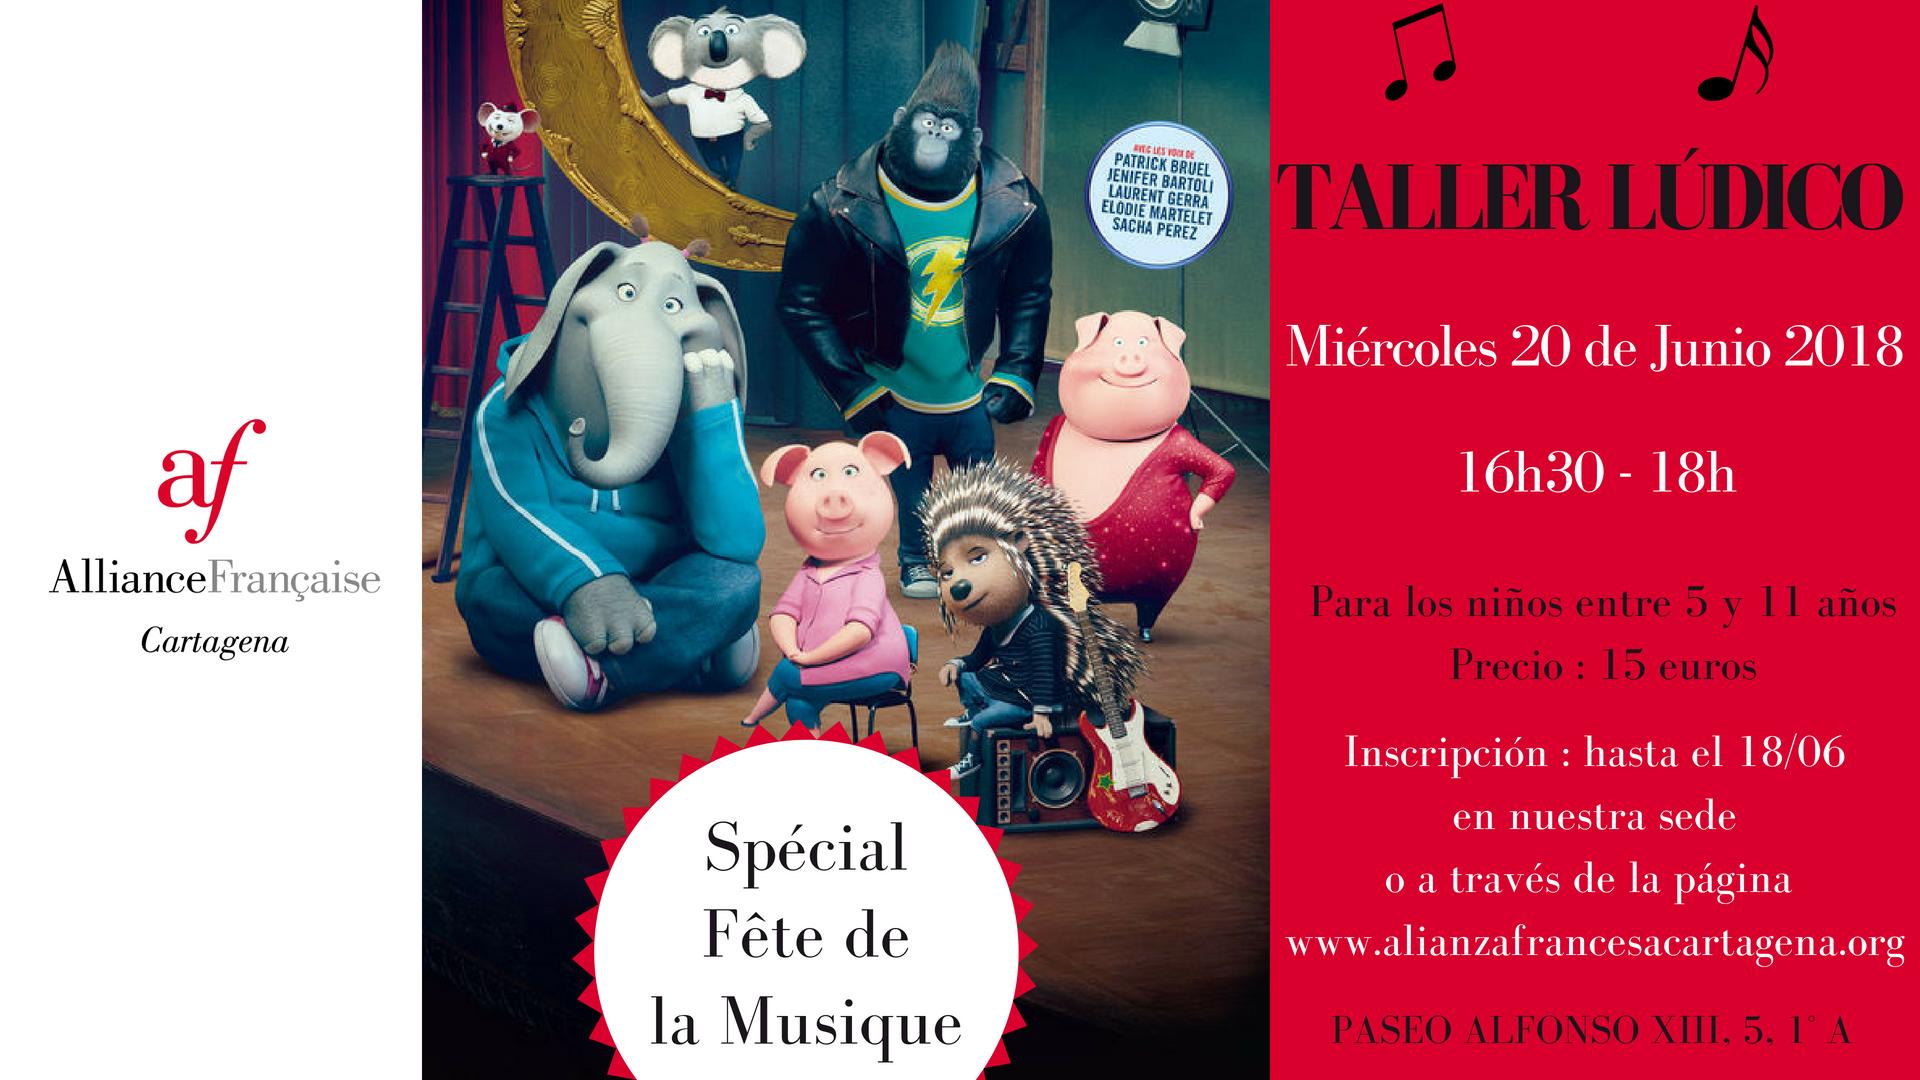 Taller lúdico Spécial #FêtedelaMusique 6